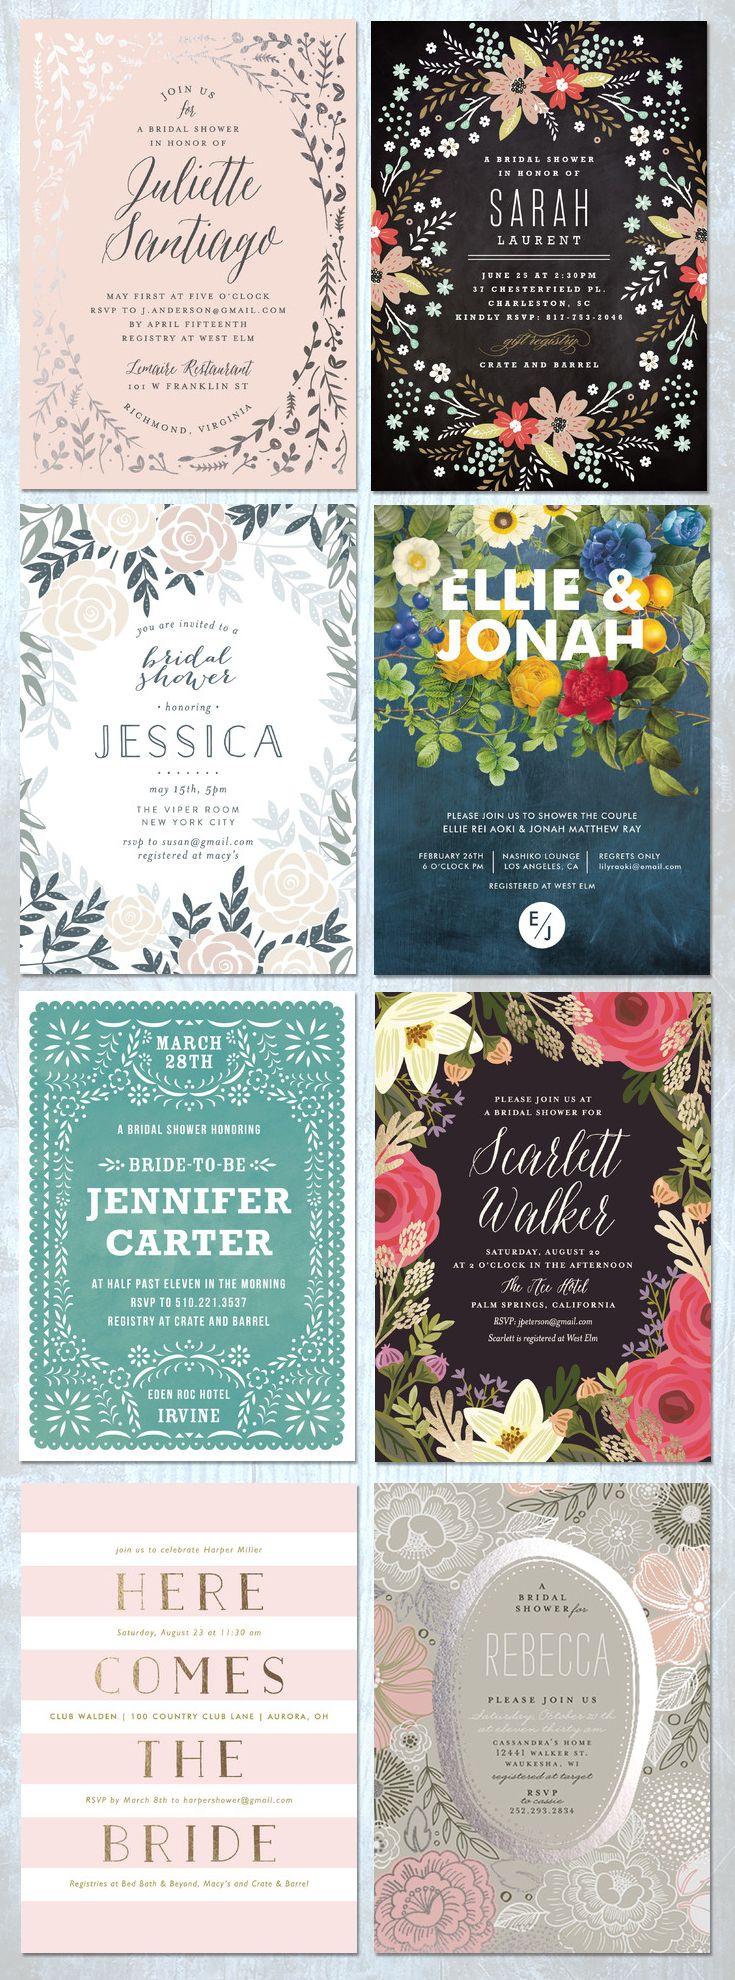 creative bridal shower invitation ideas%0A Minted Bridal Shower Invitations